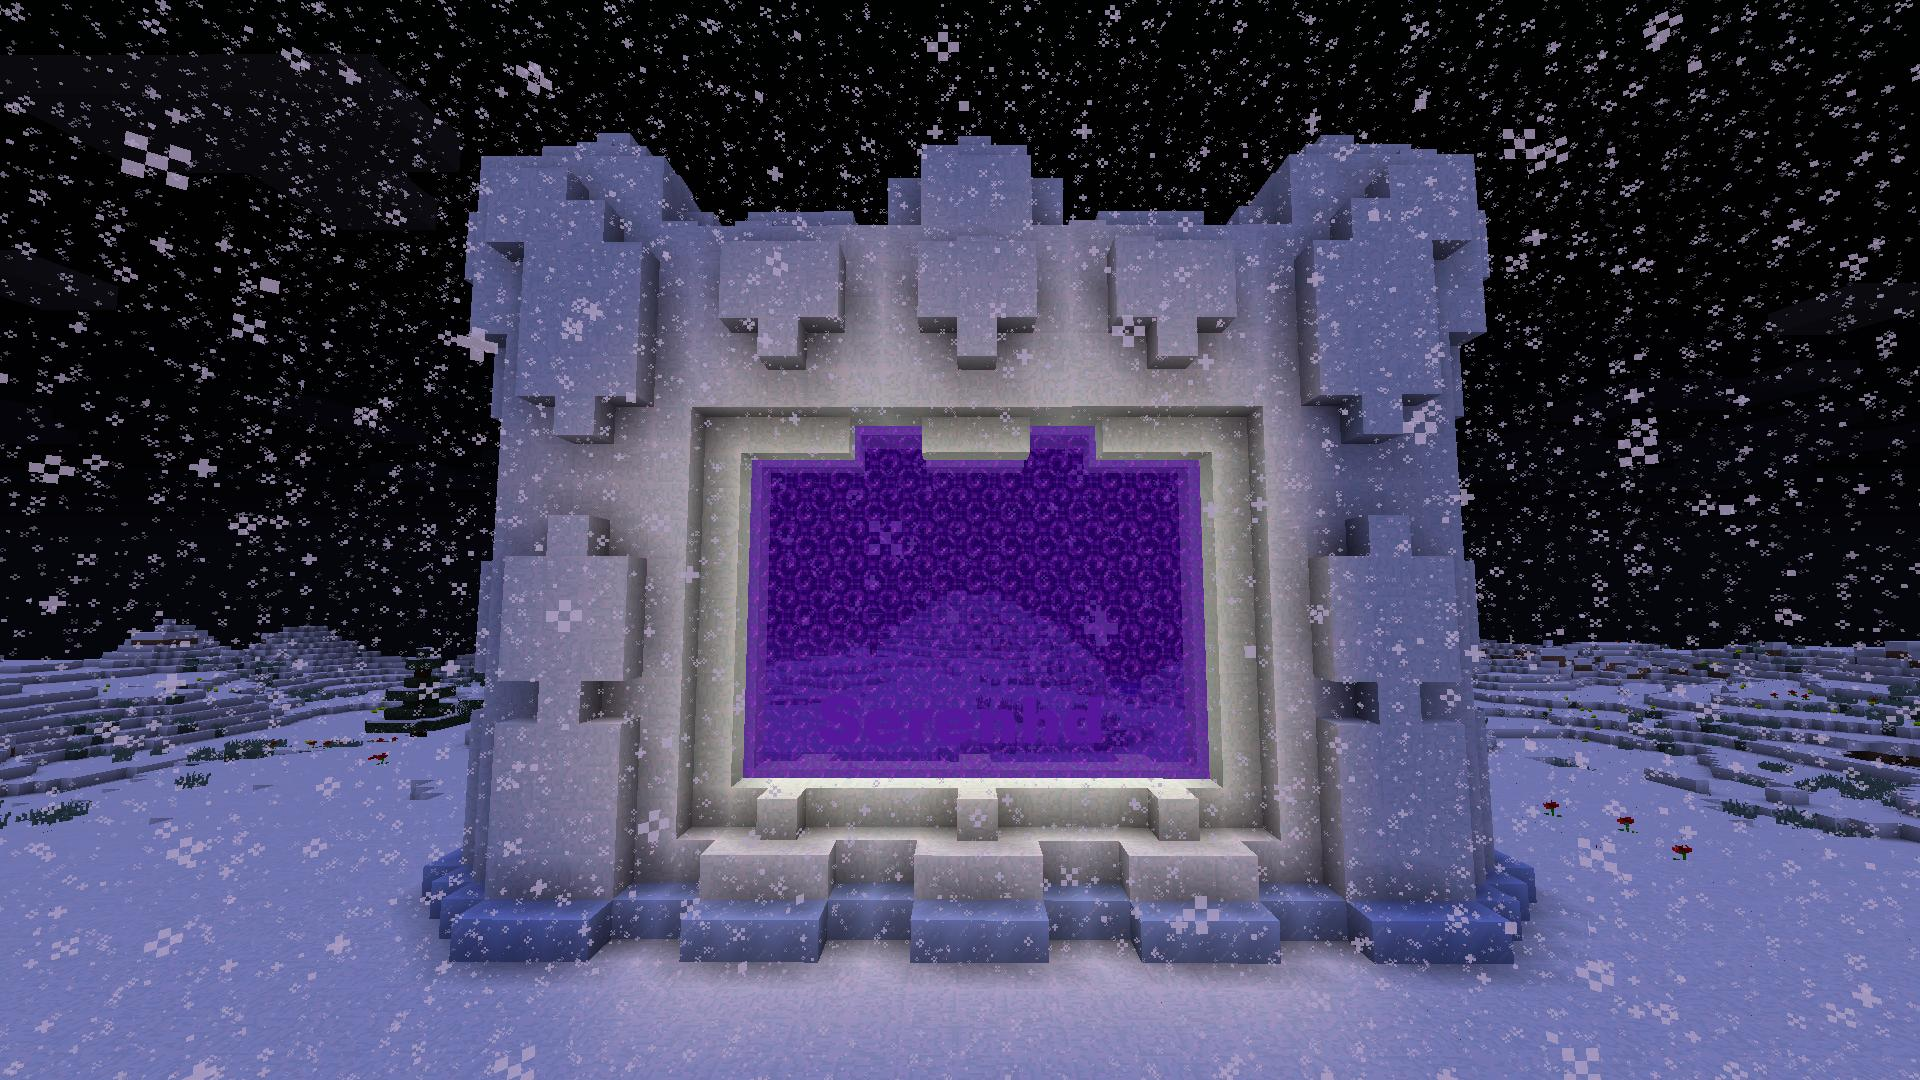 Minecraft Creations 🔥 on Twitter: